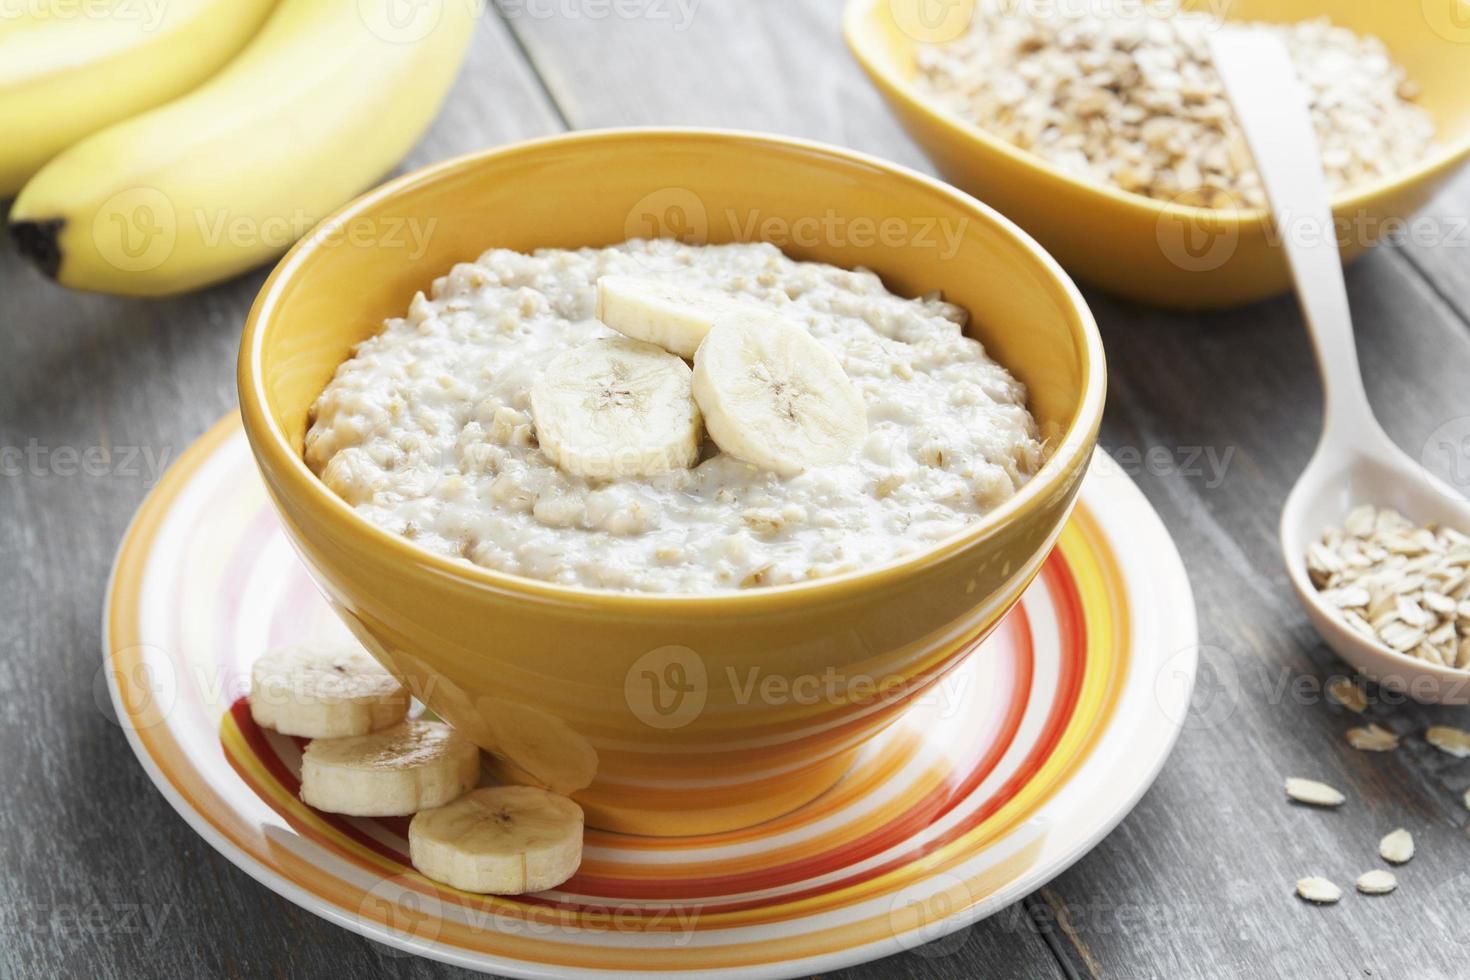 Oatmeal with bananas photo